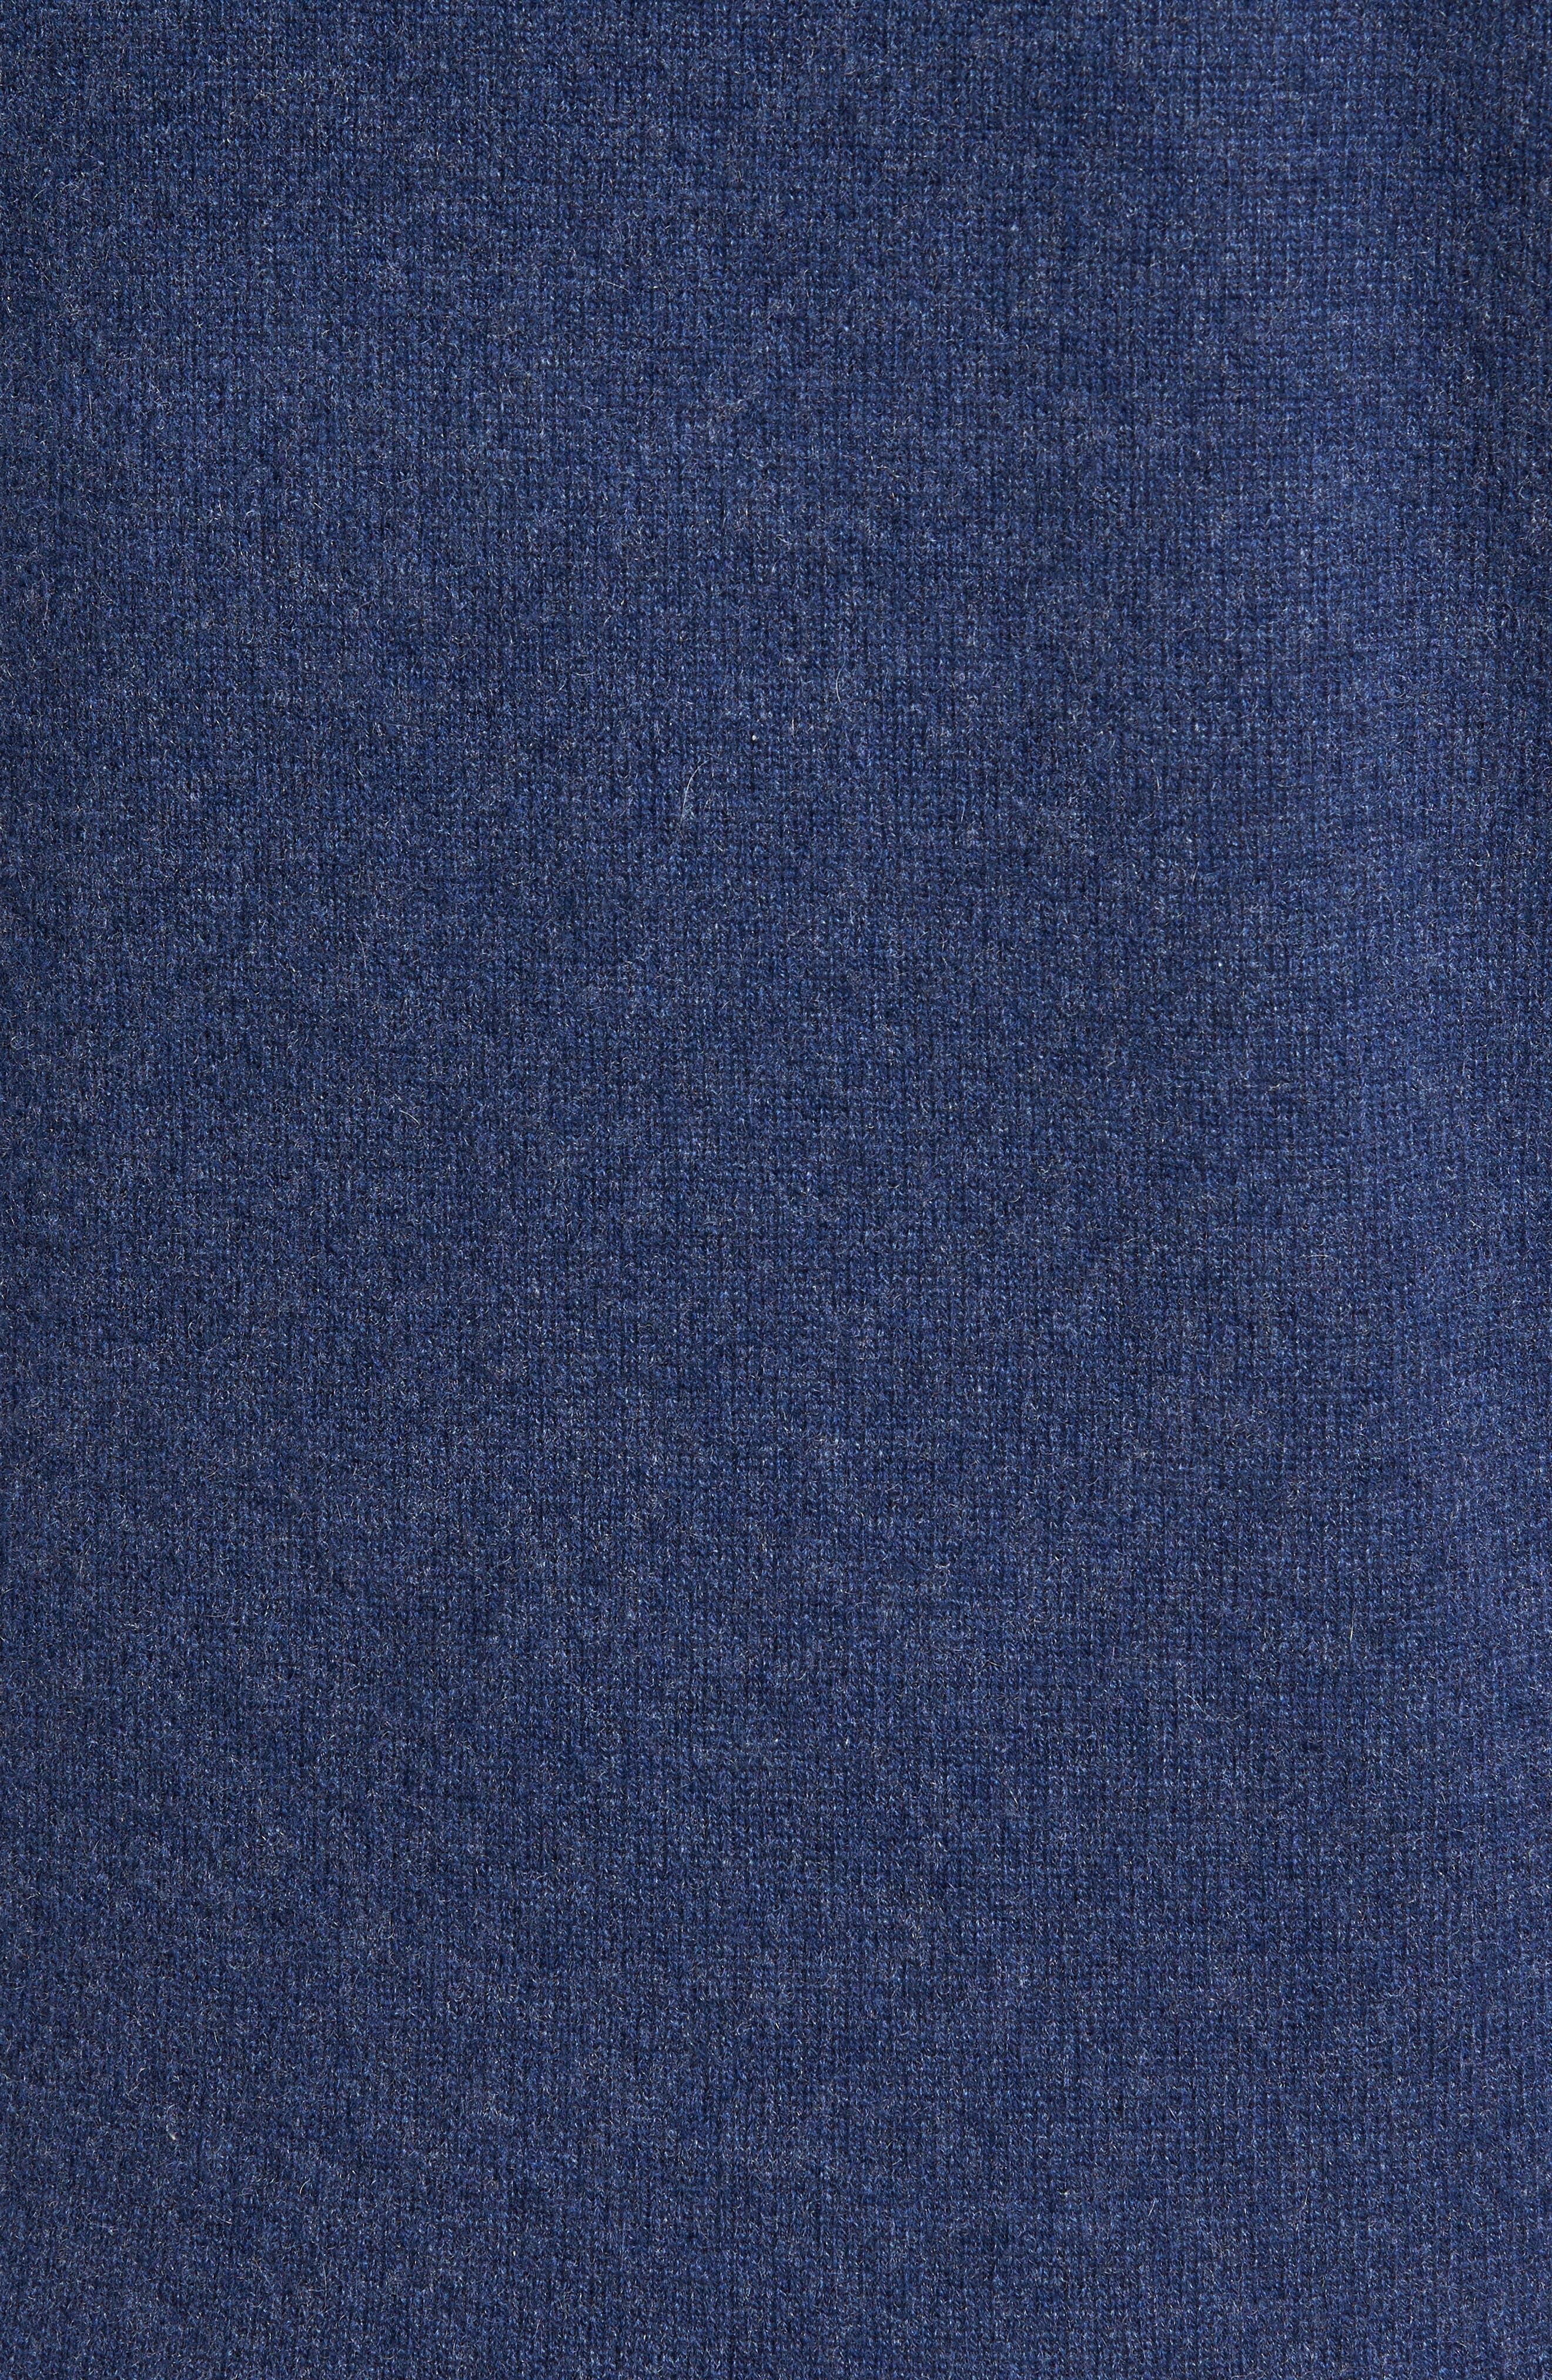 Cashmere V-Neck Sweater,                             Alternate thumbnail 5, color,                             BLUE ESTATE HEATHER